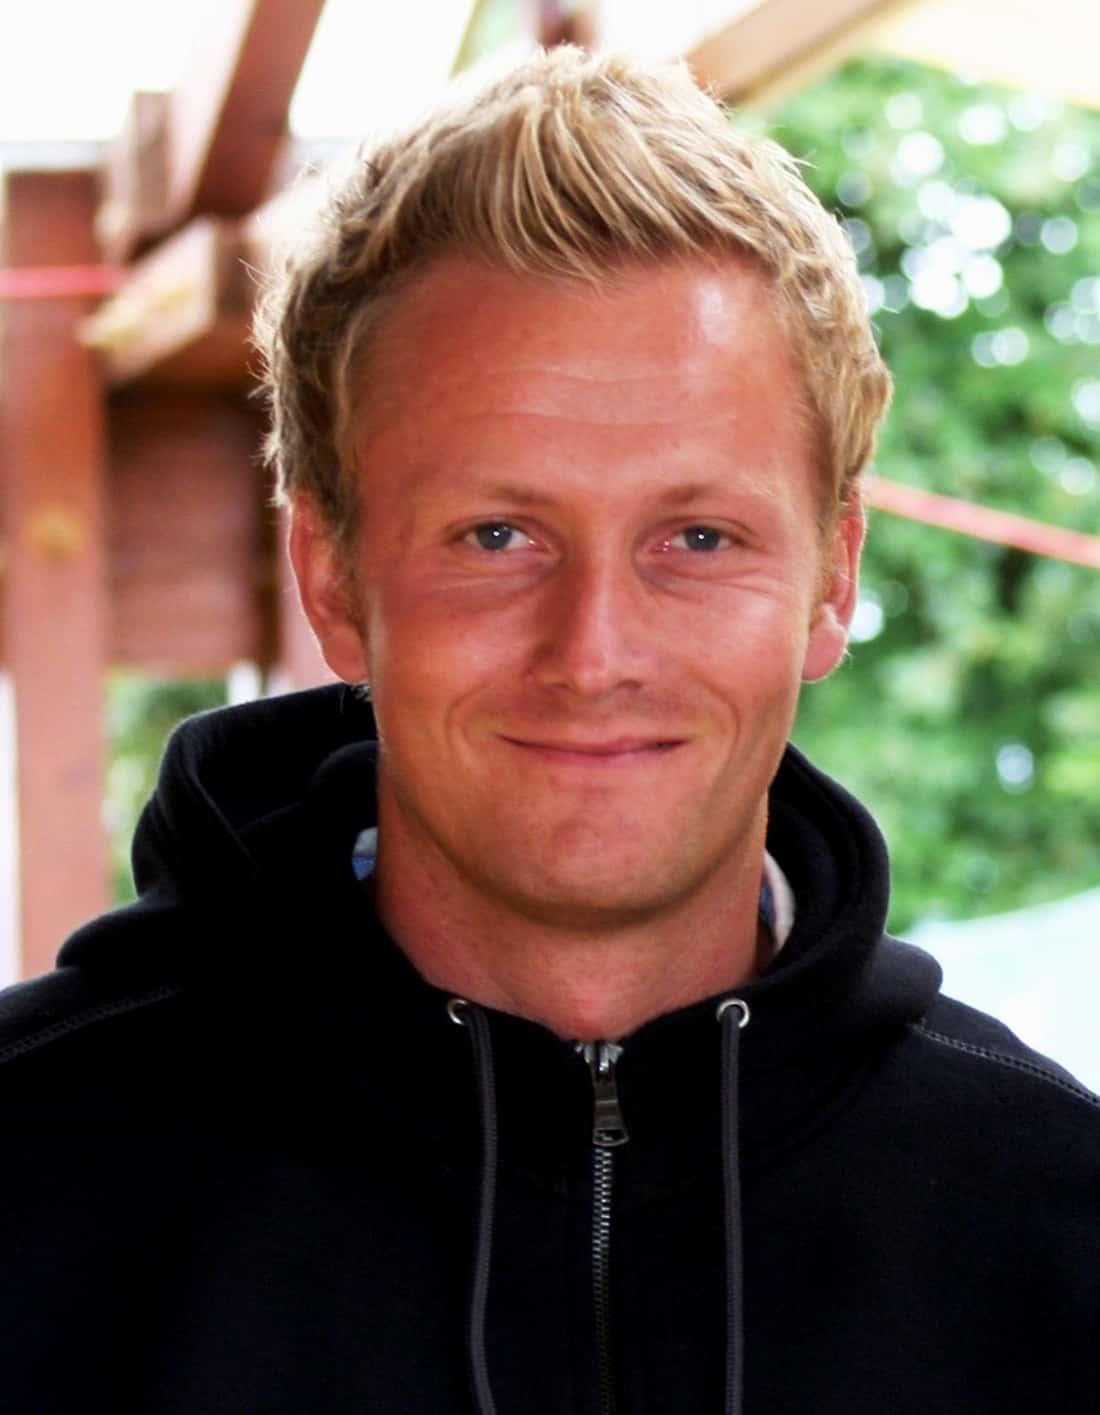 Markus Rosensky